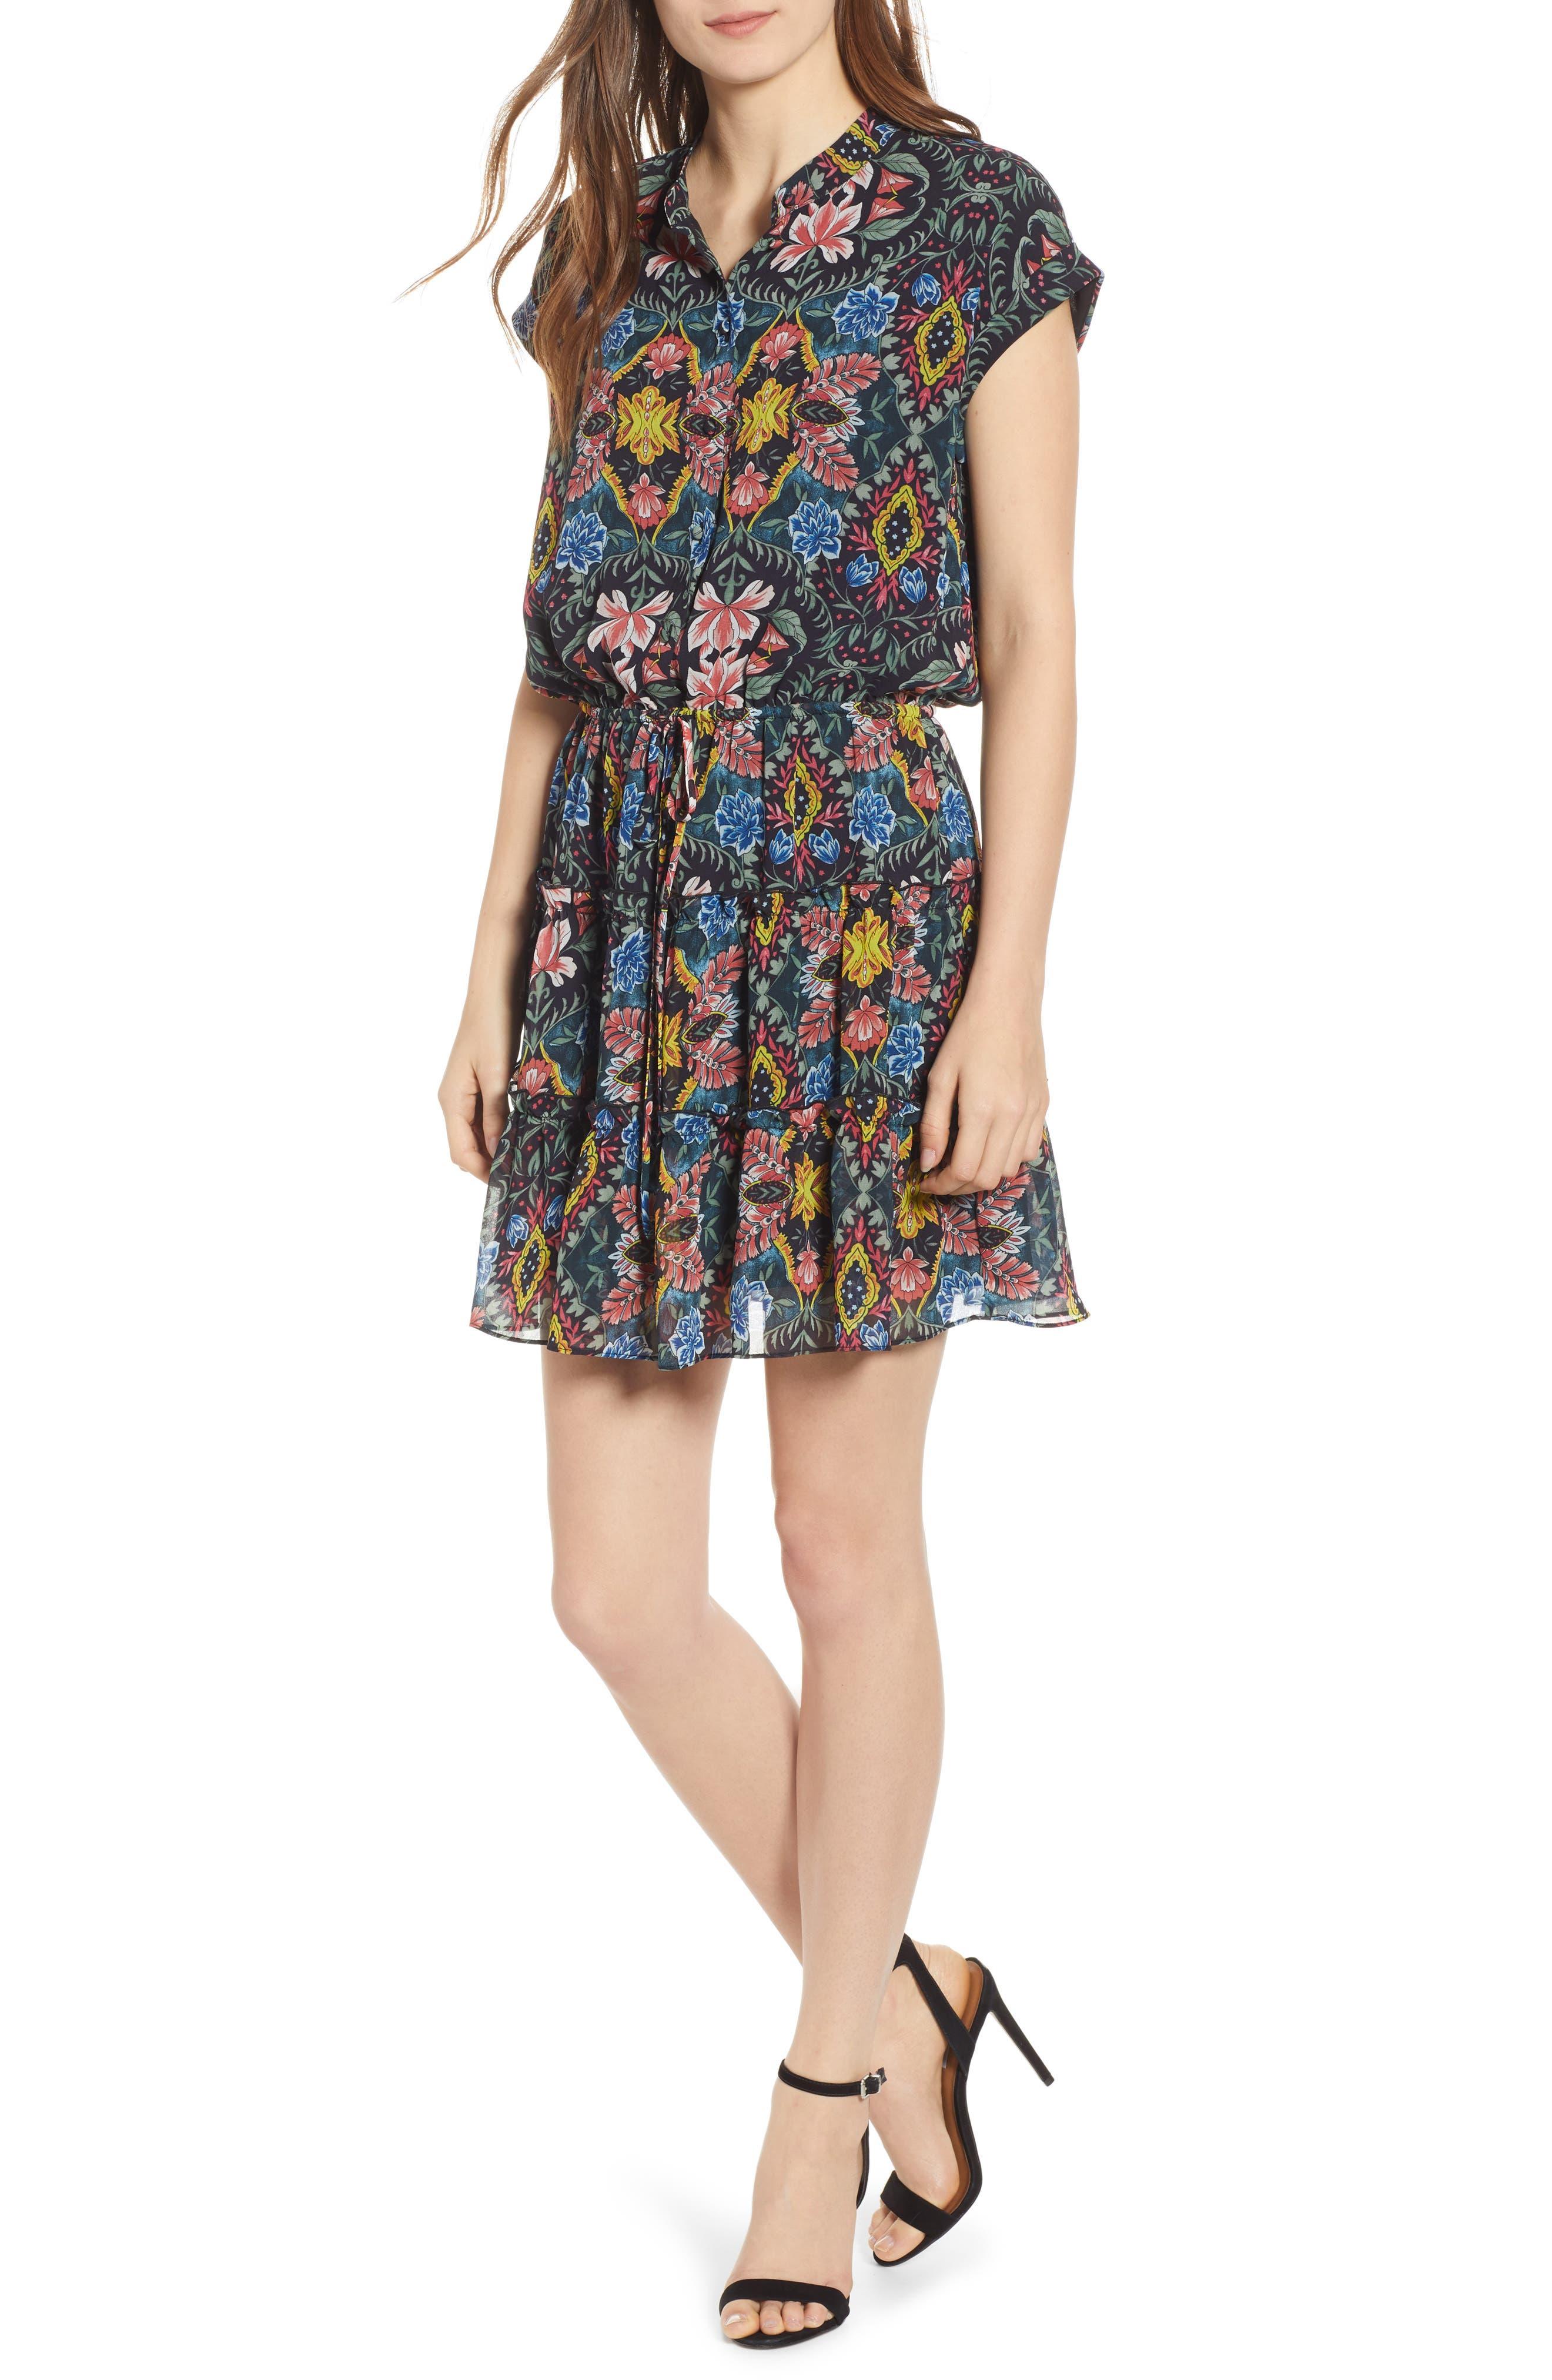 Rebecca Minkoff Ollie Floral Minidress, Black